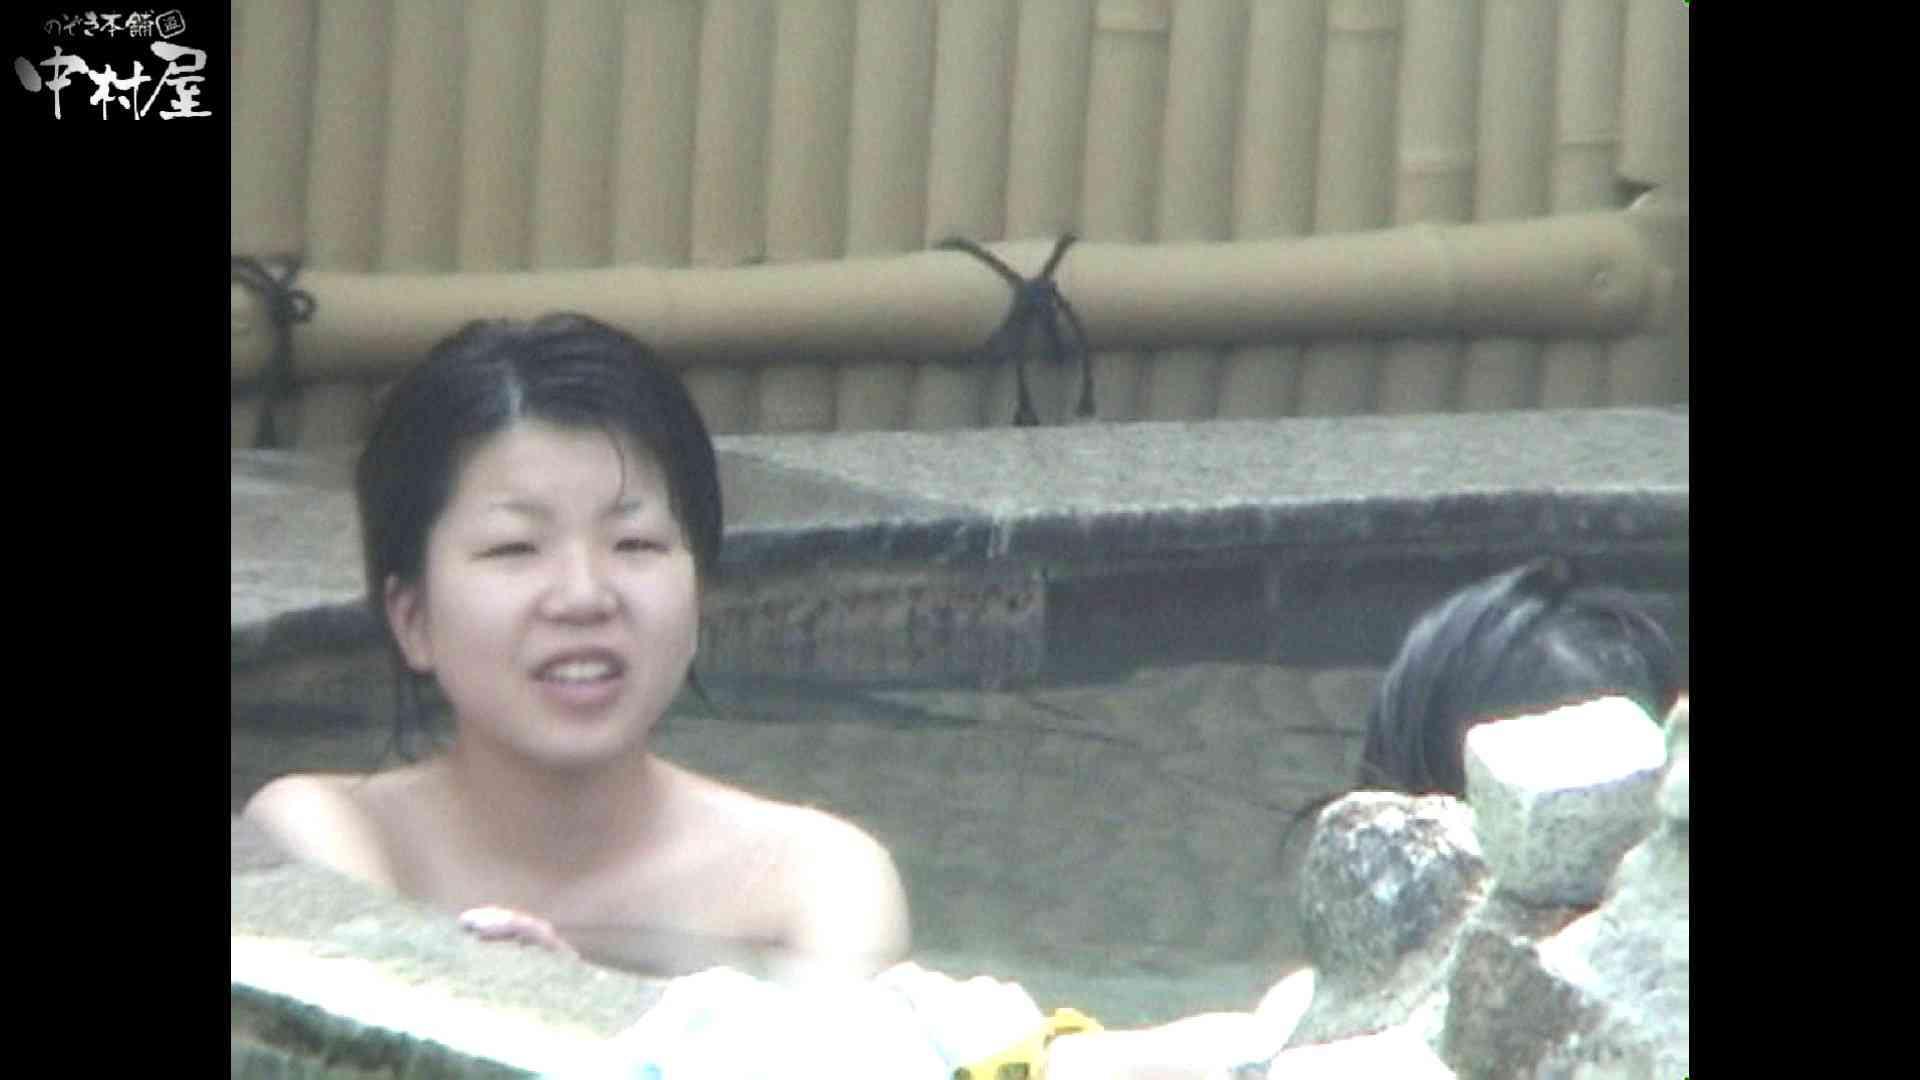 Aquaな露天風呂Vol.936 OLセックス 覗きぱこり動画紹介 75画像 26